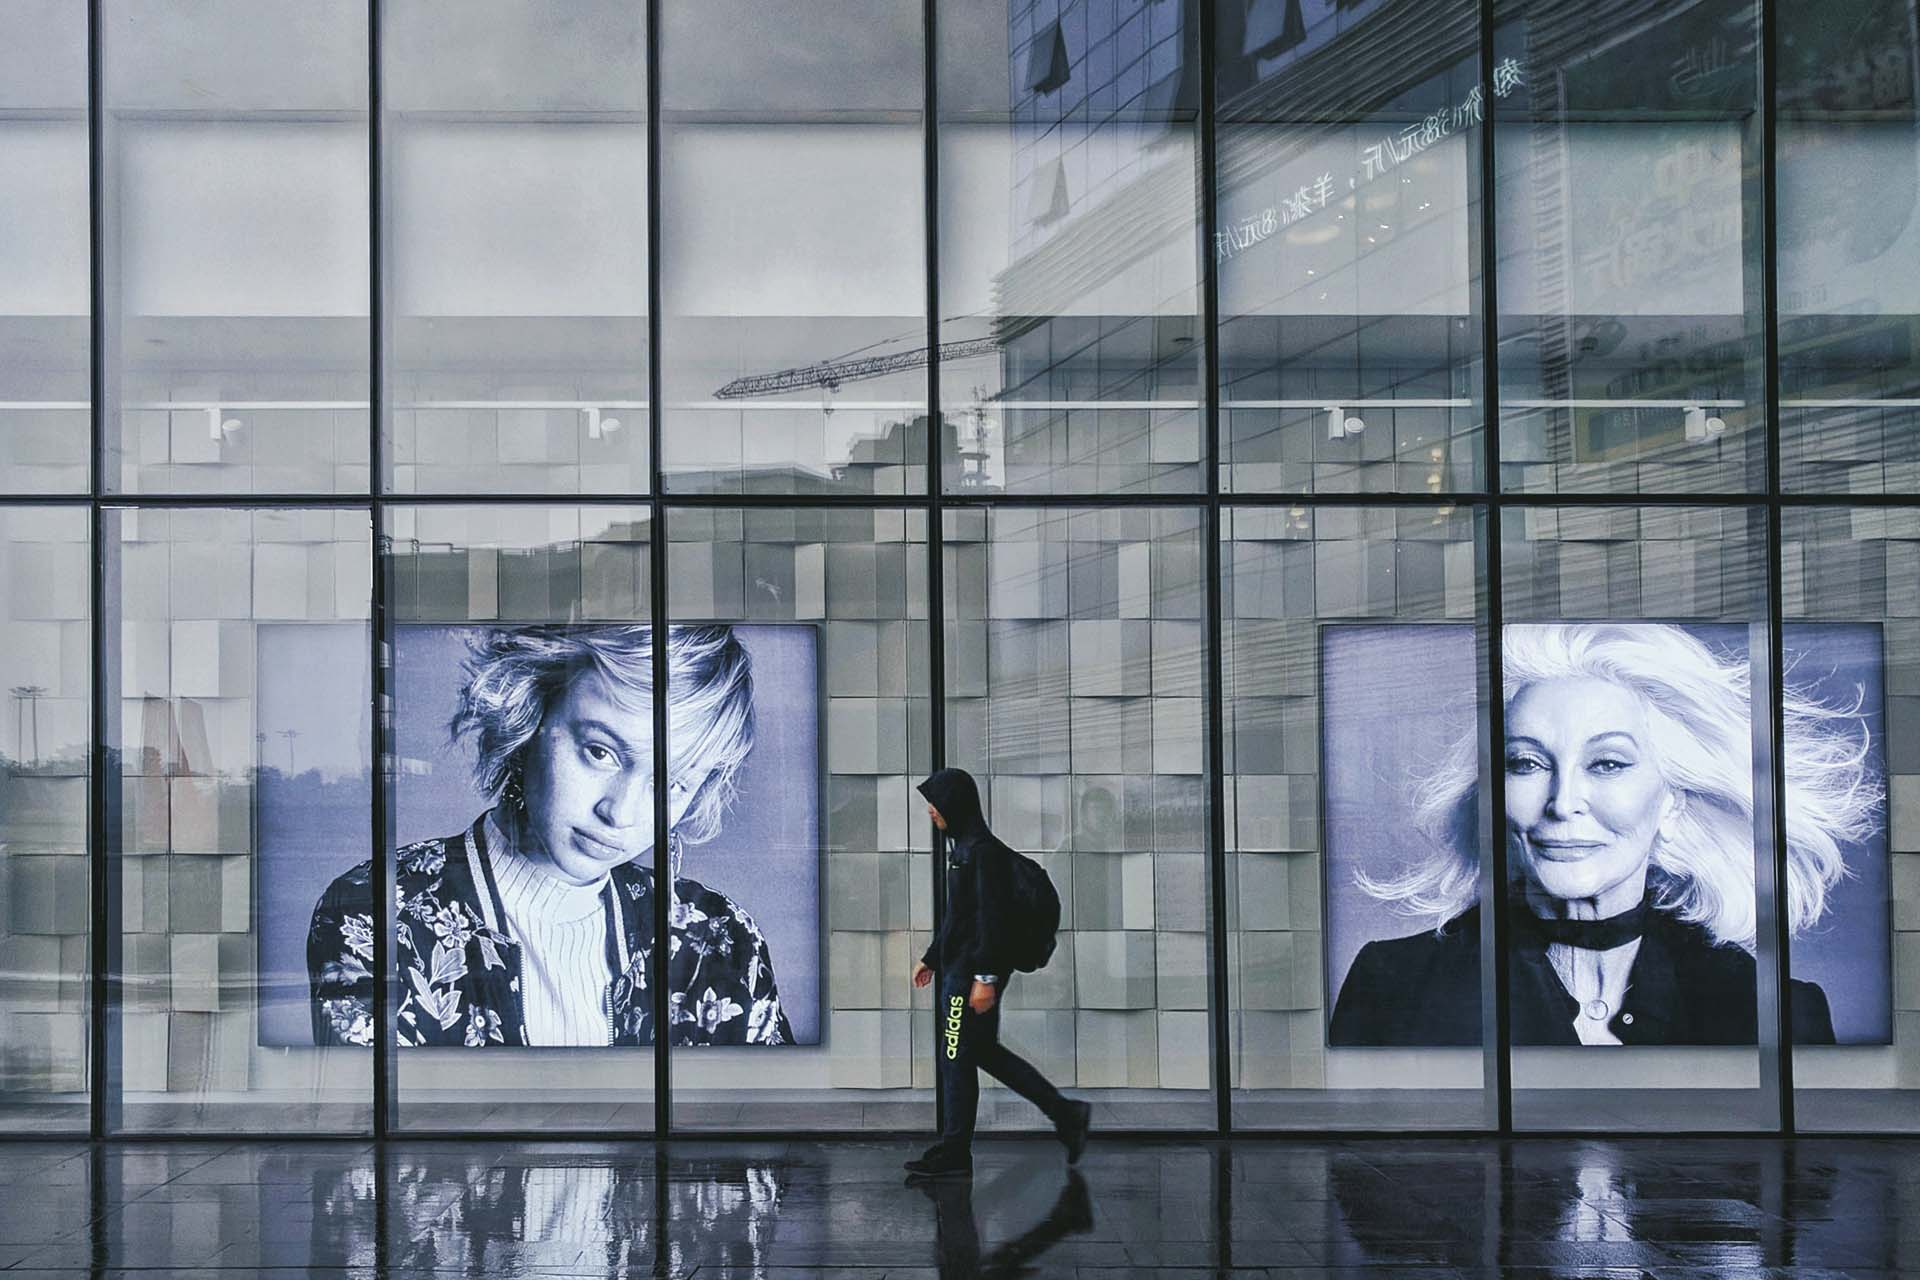 Digital Signage and Interactive Displays